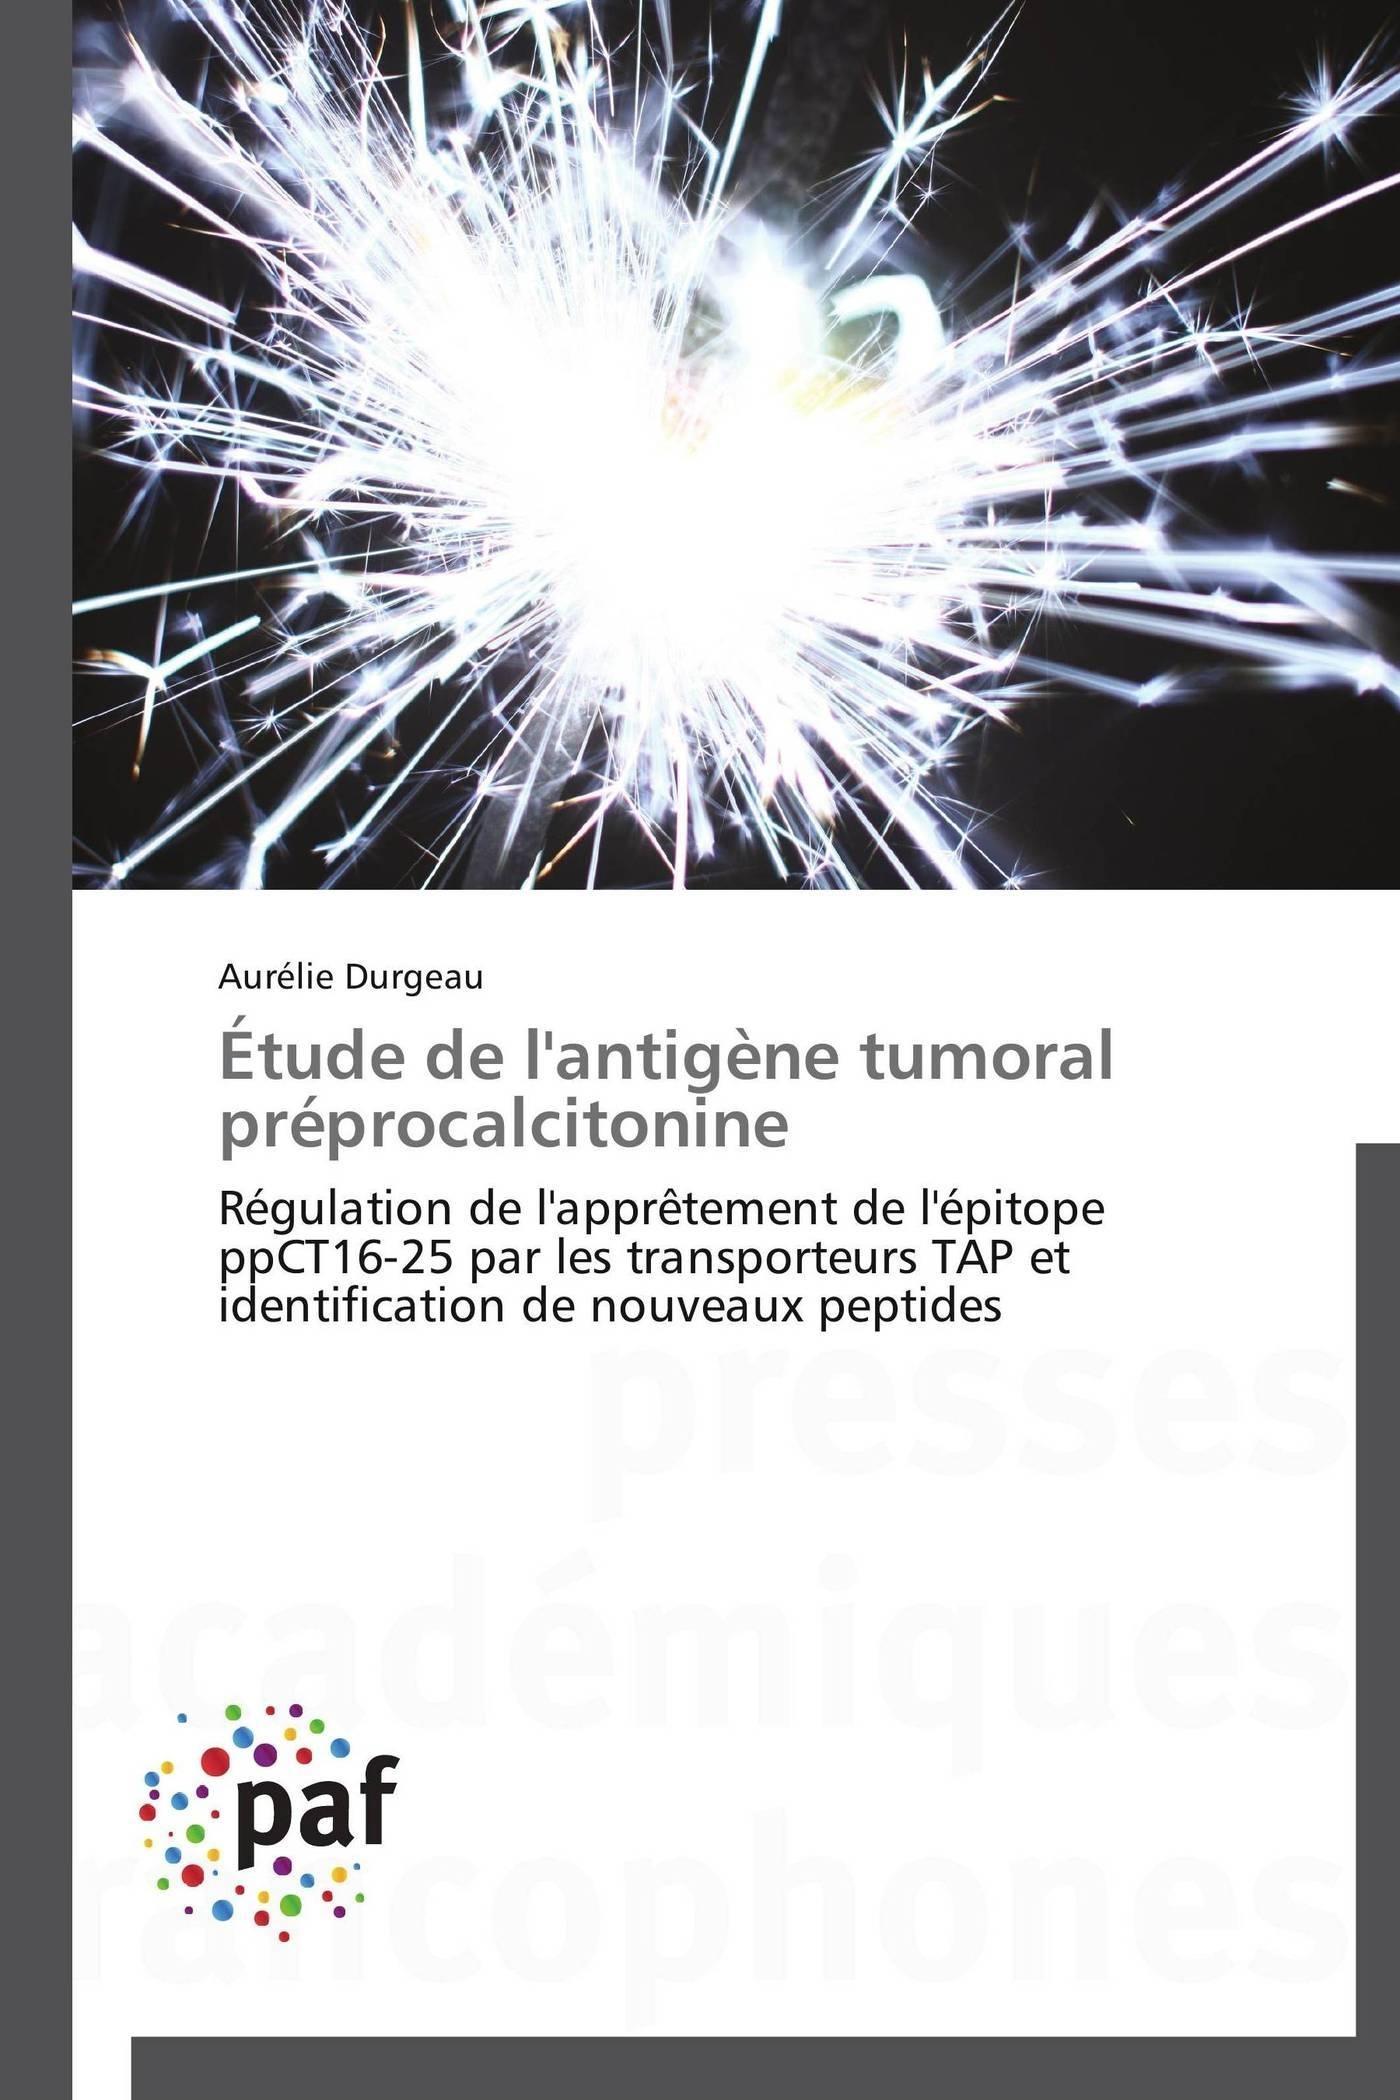 ETUDE DE L'ANTIGENE TUMORAL PREPROCALCITONINE